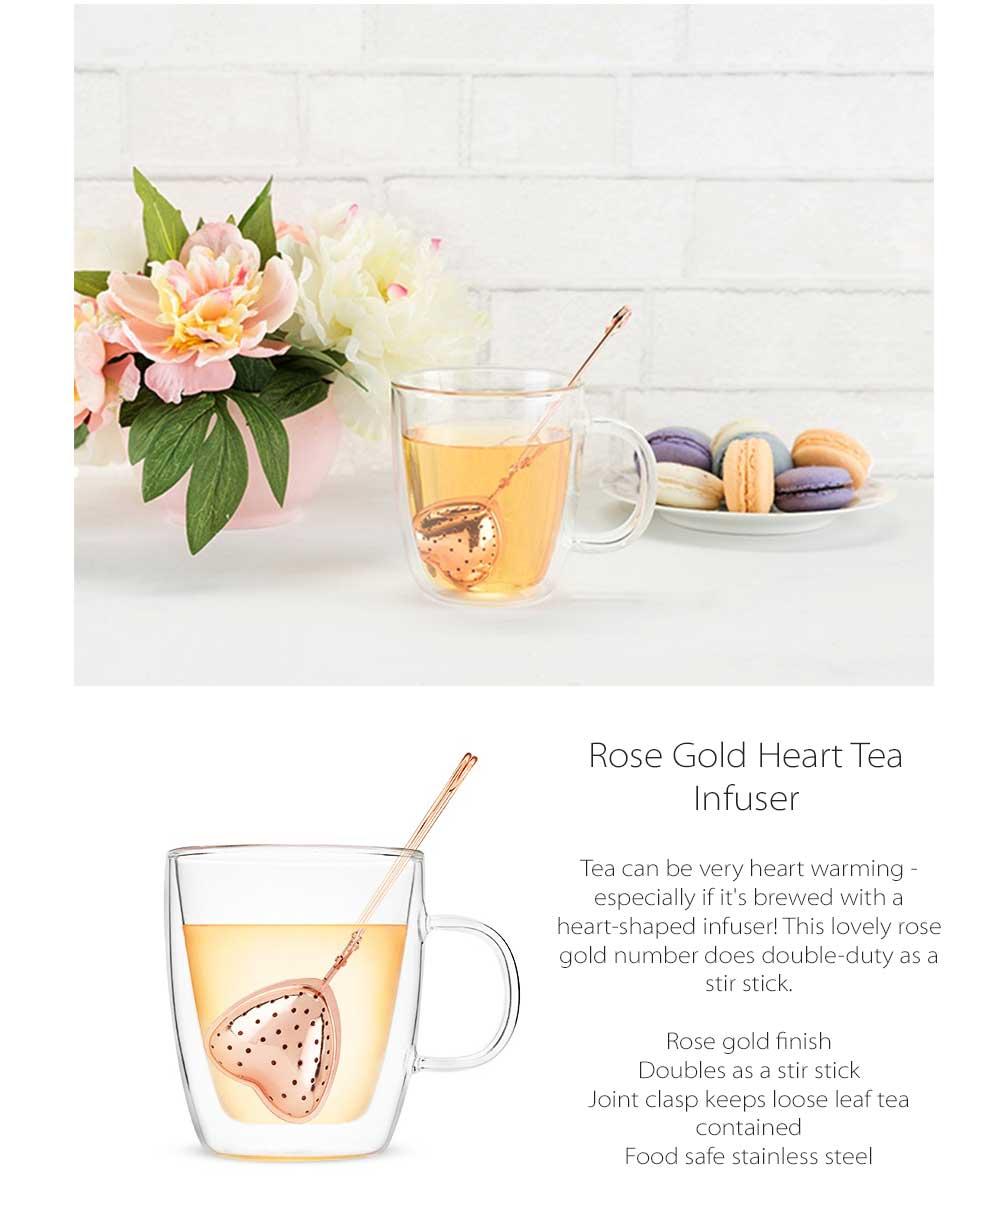 Rose Gold Tea Infuser Doubles As A Stir Stick